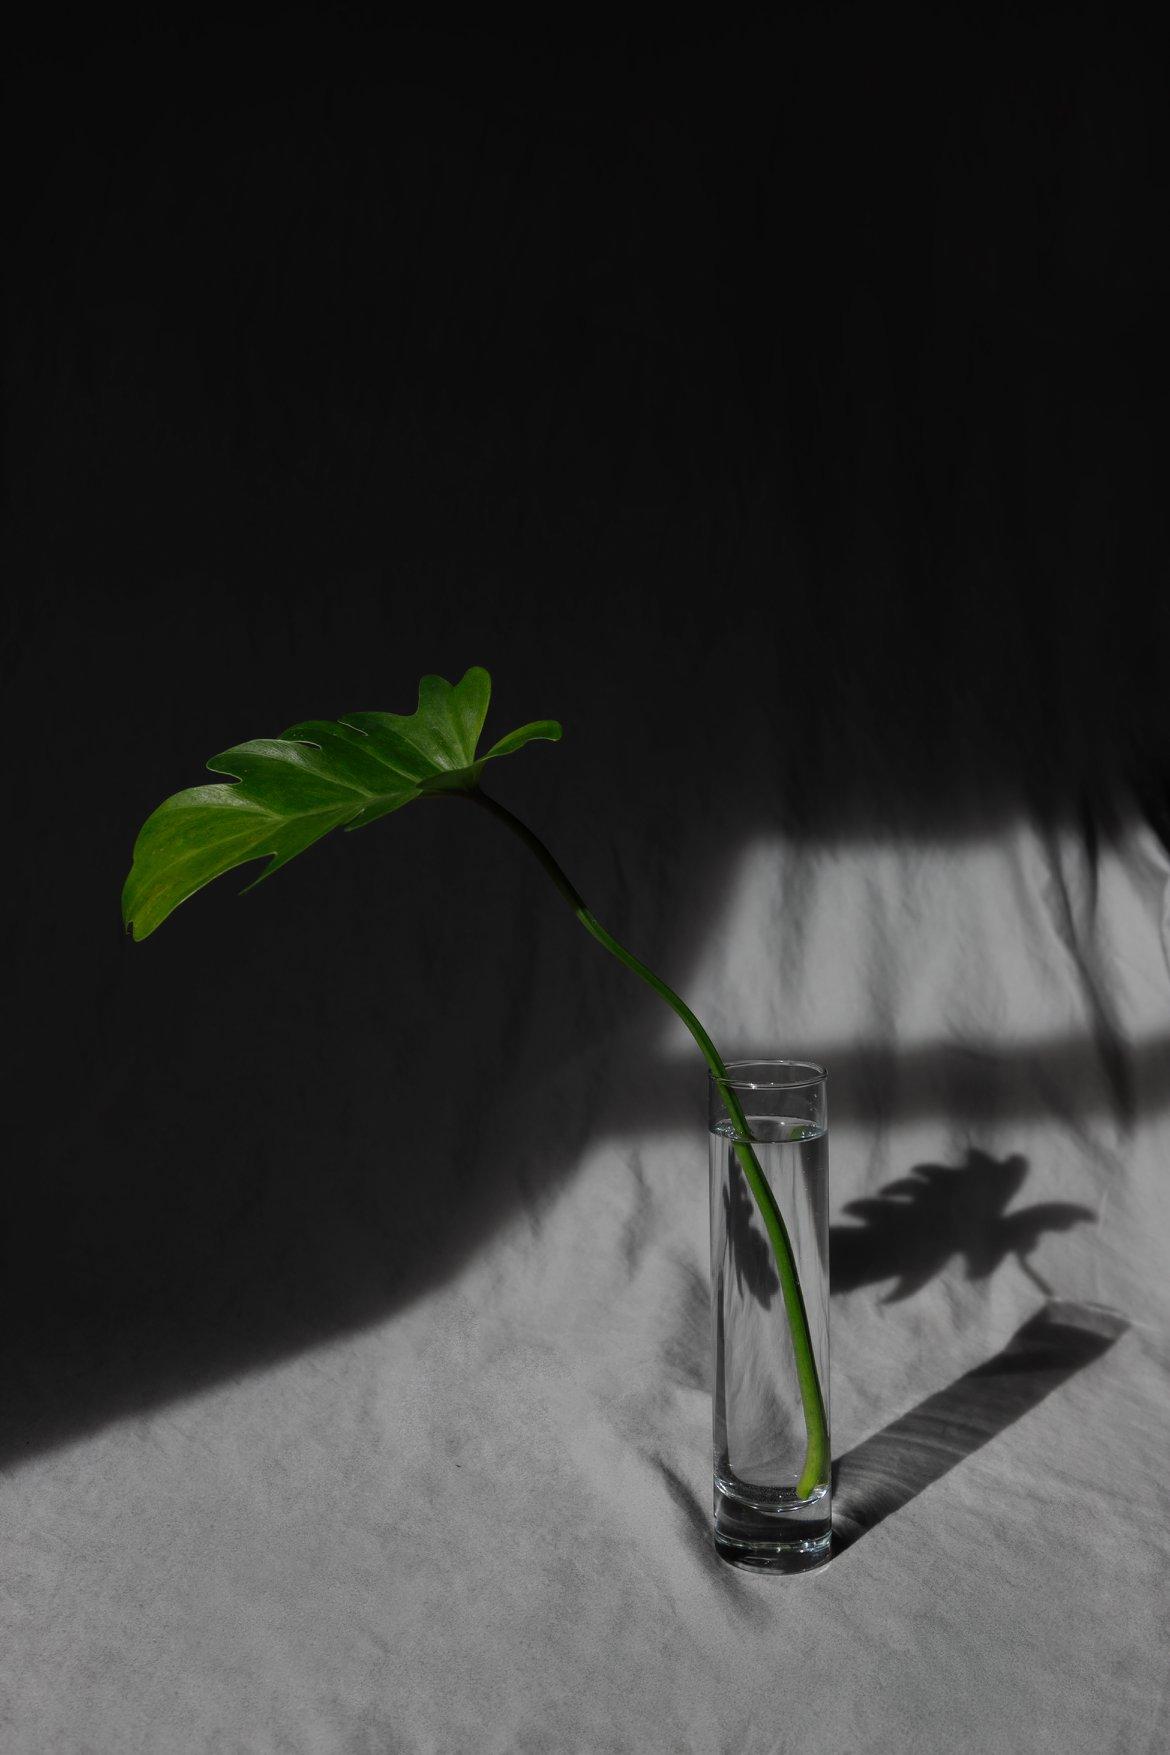 still life plant leaf xanandu harsh light shadows